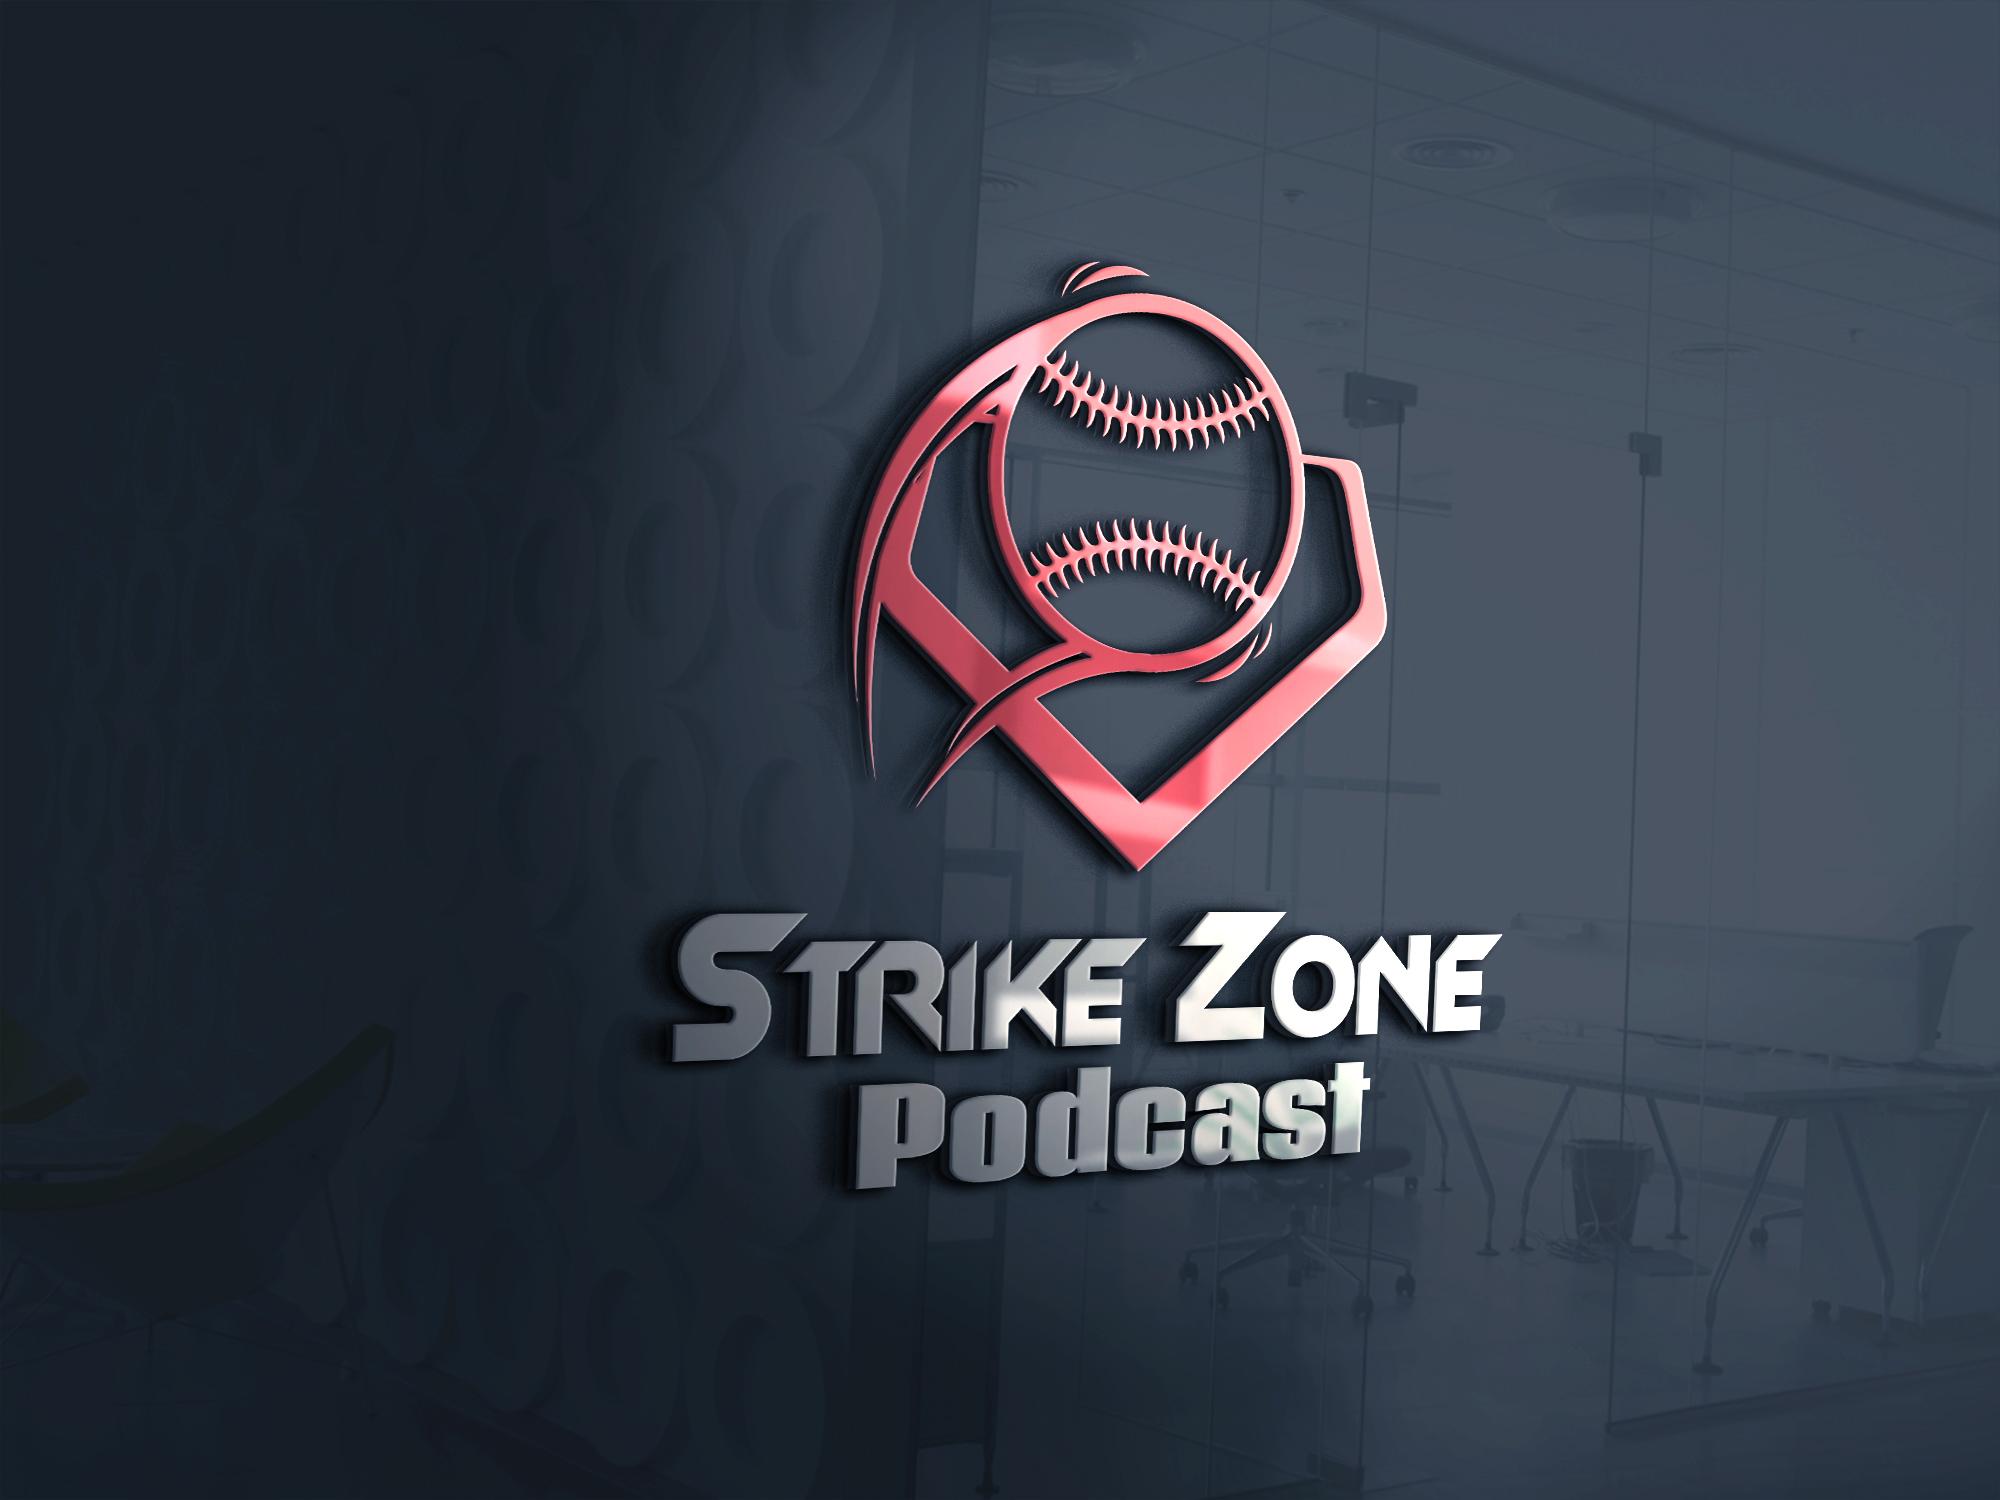 The Strike Zone